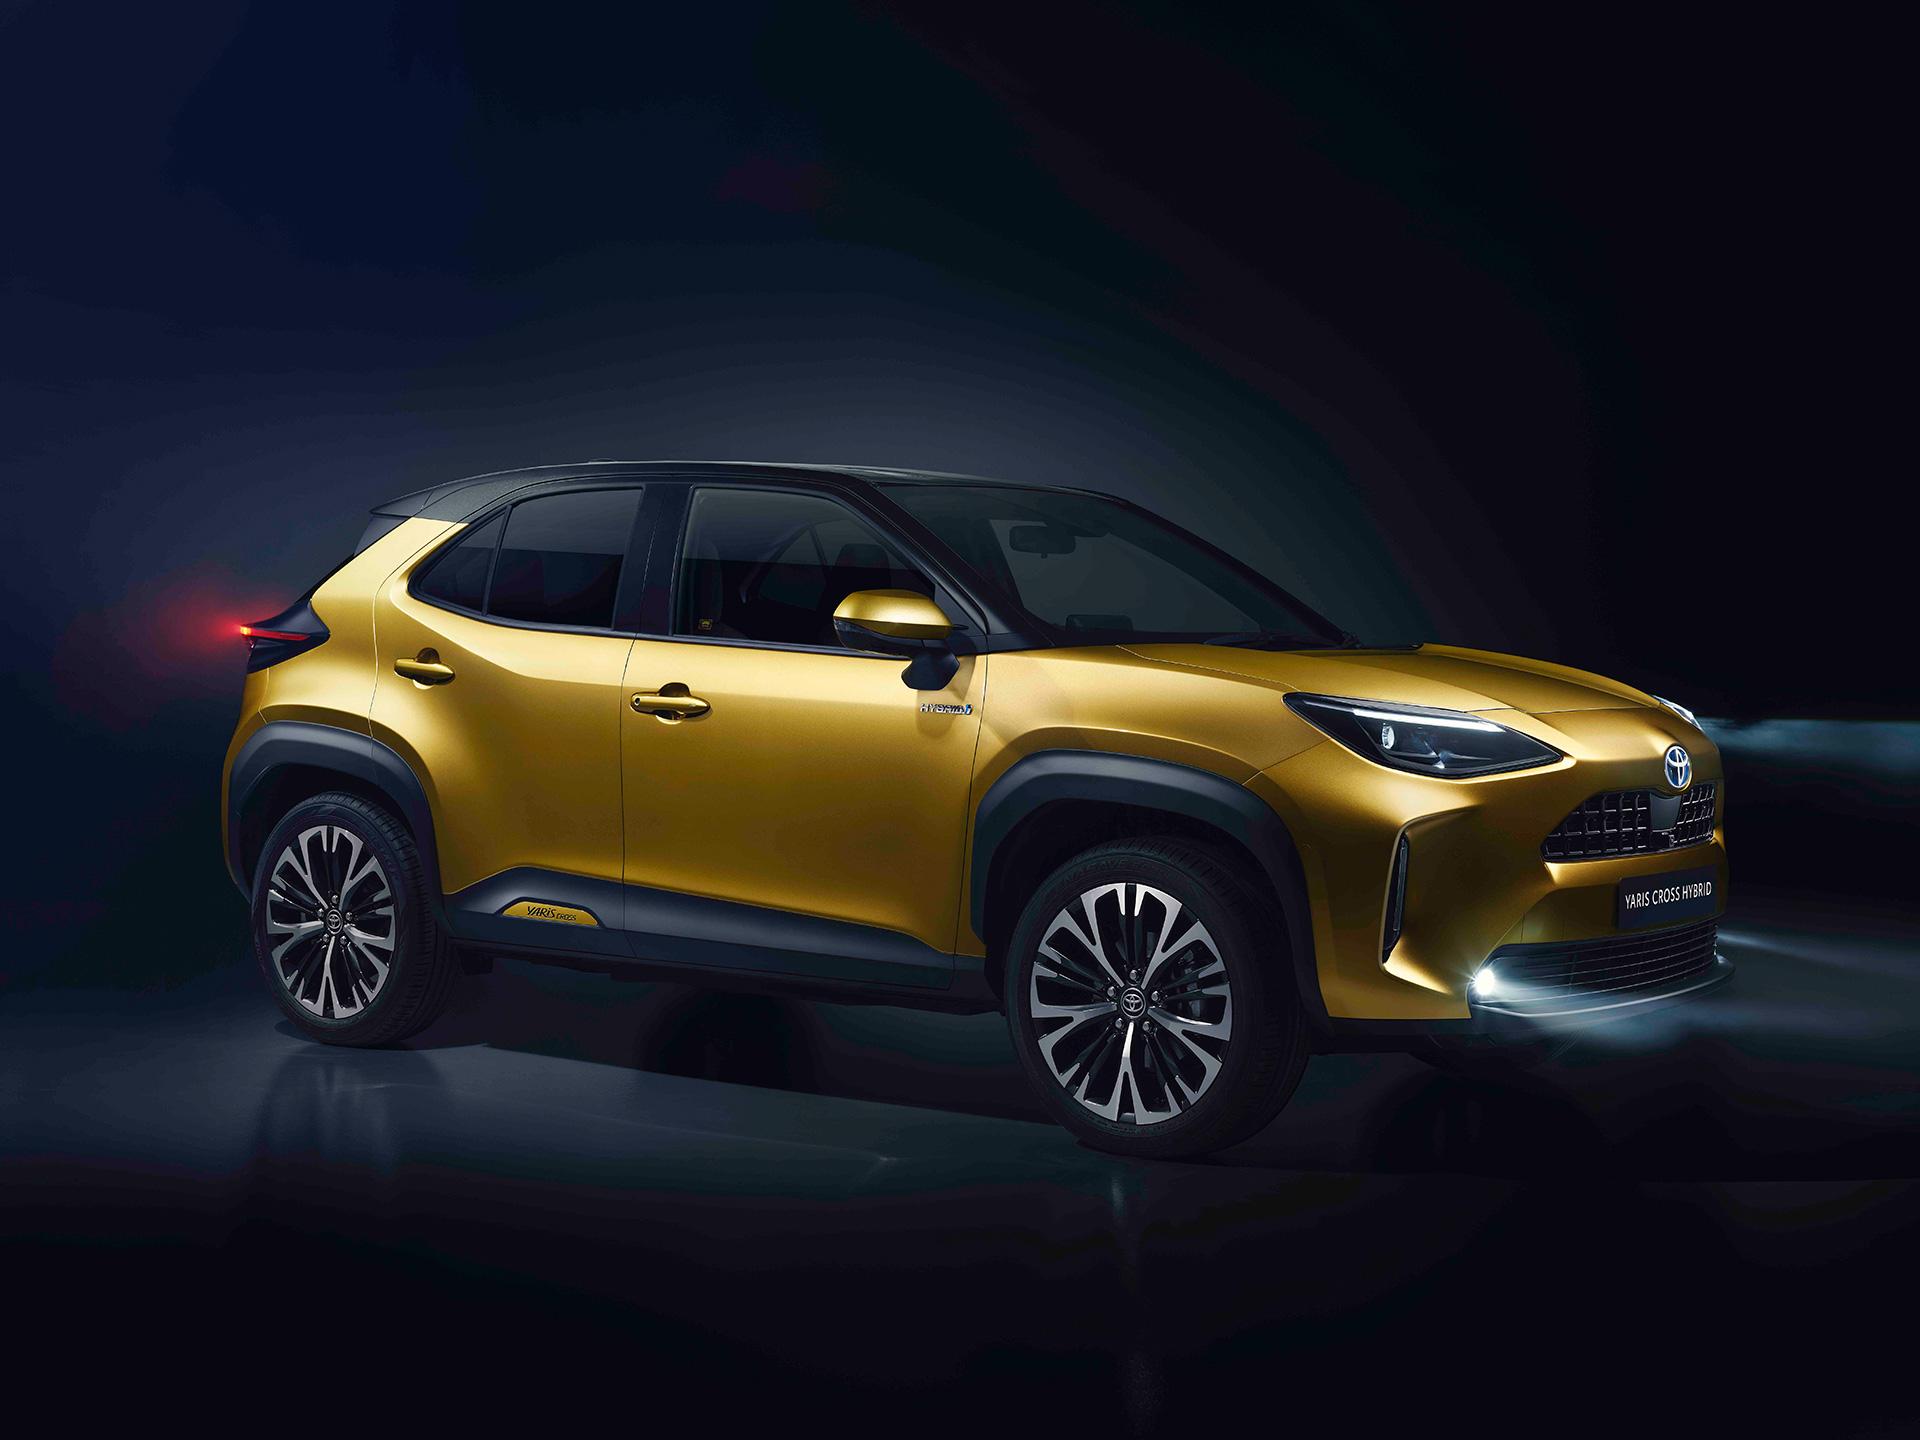 Toyota's Yaris Cross Makes World Debut - Image 4